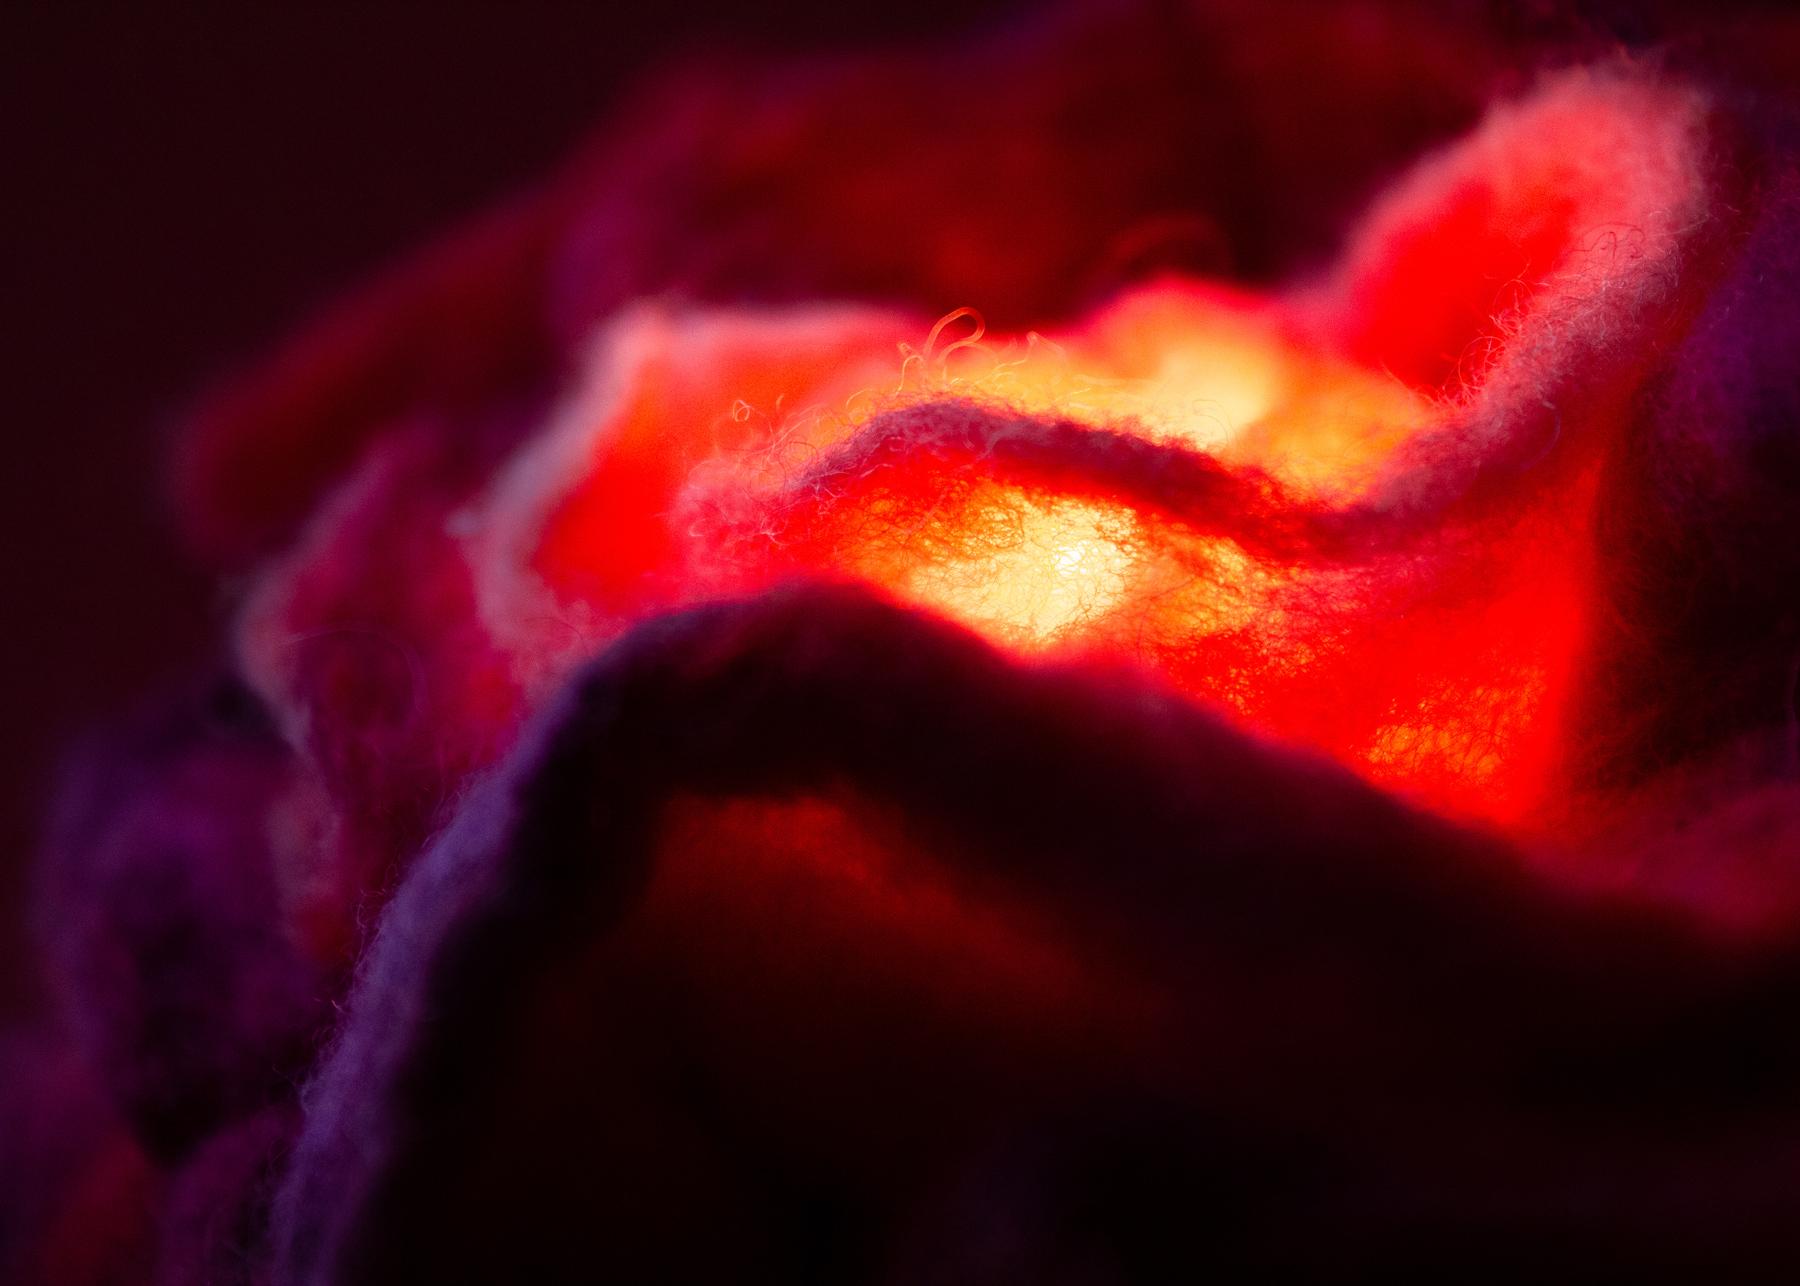 felt-flower-lamp_Cherry-Rose_Adelya-Tumasyeva_7.jpg